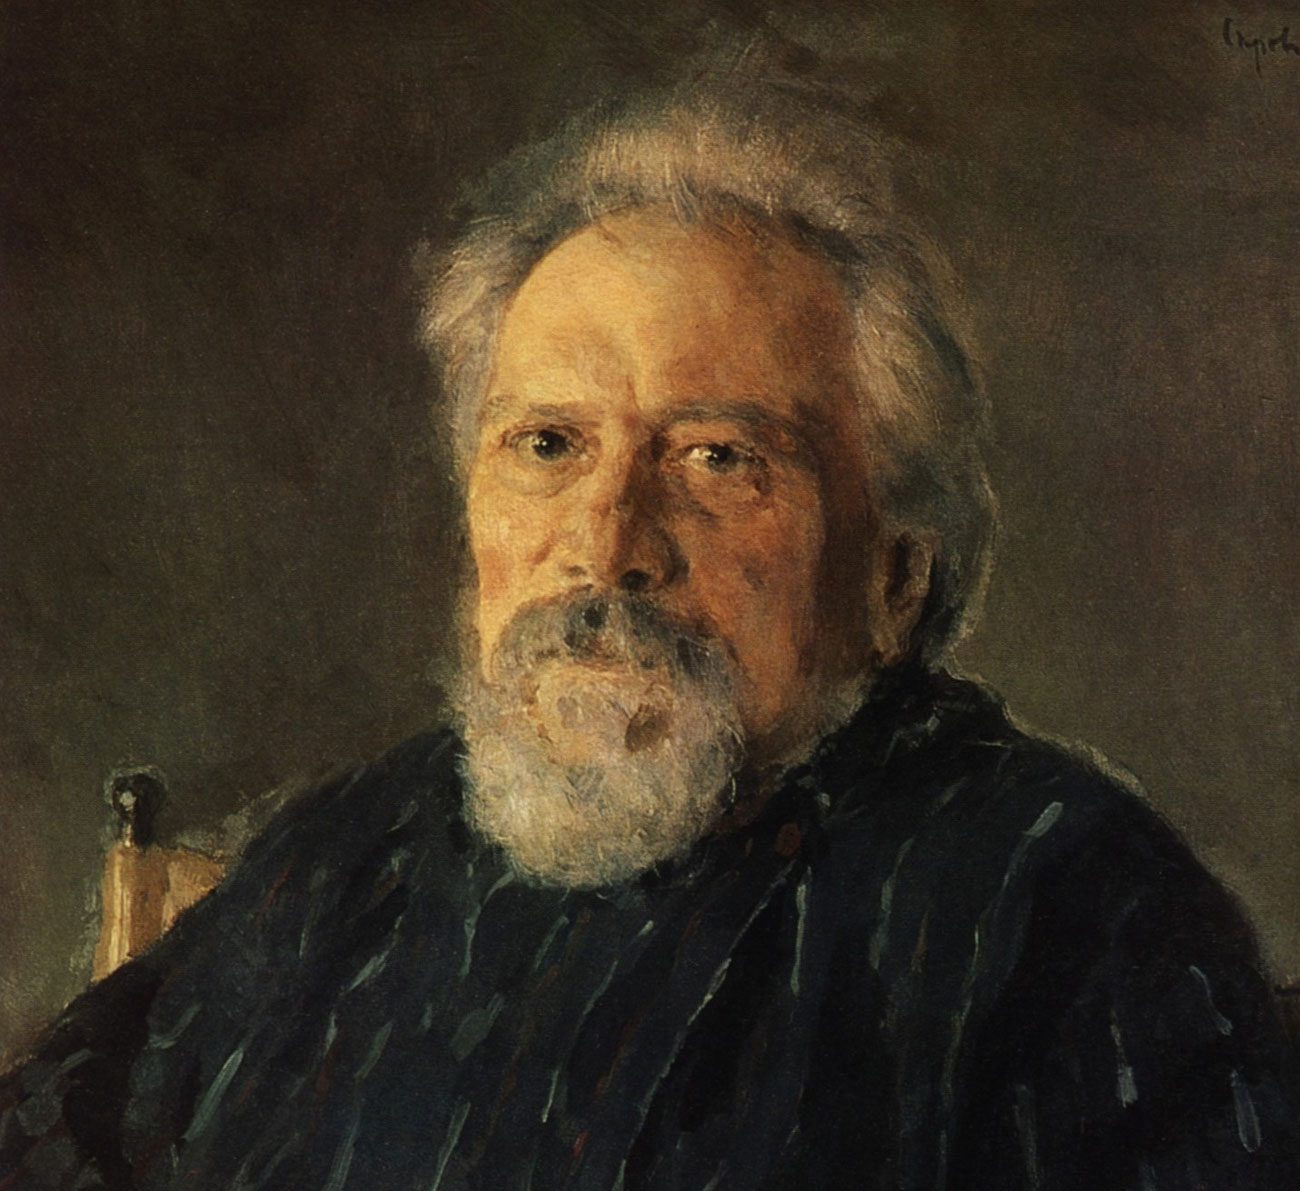 Portrait of Nikolai Leskov by Valentin Serov / wikipedia